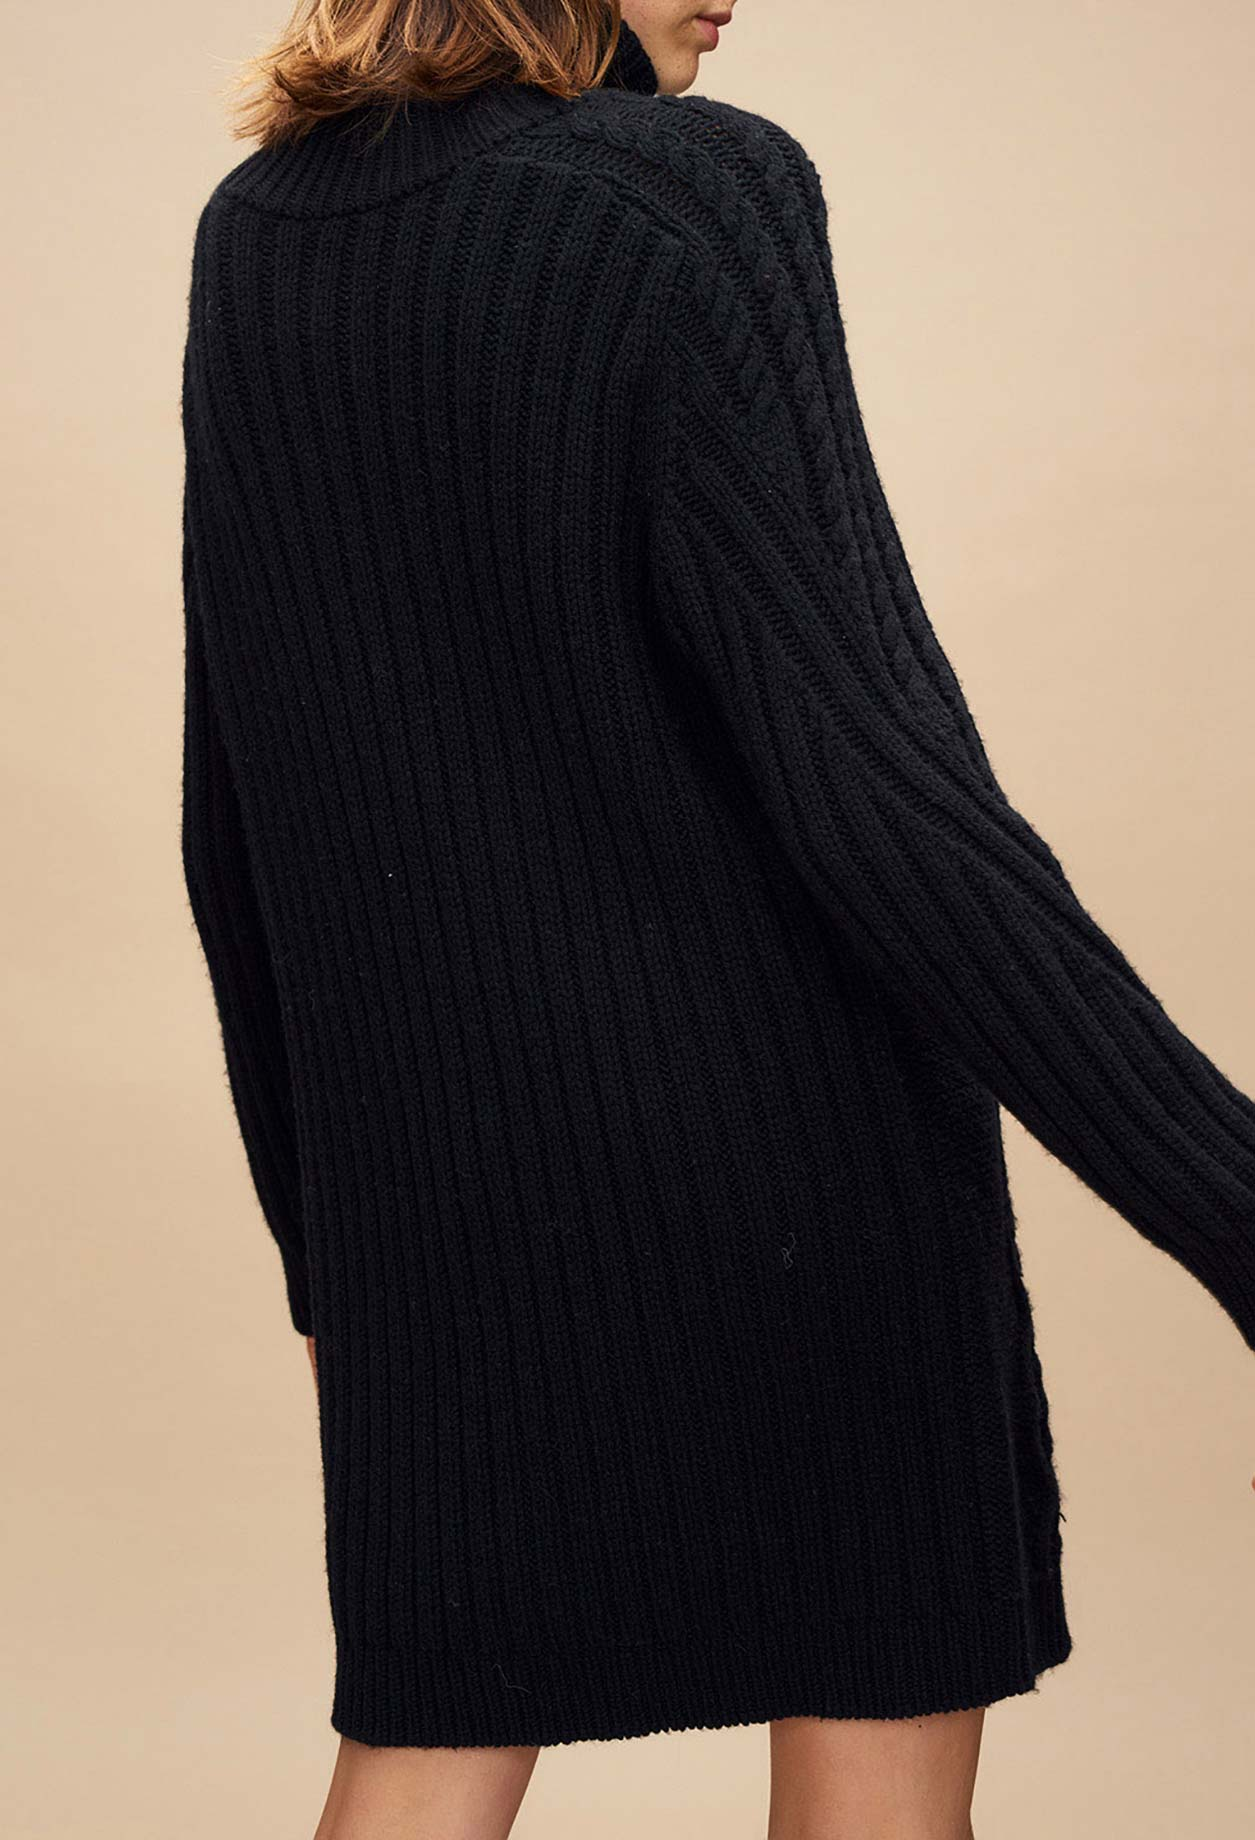 usine authentique 01934 9c513 Robe pull col roulé maille irlandaise